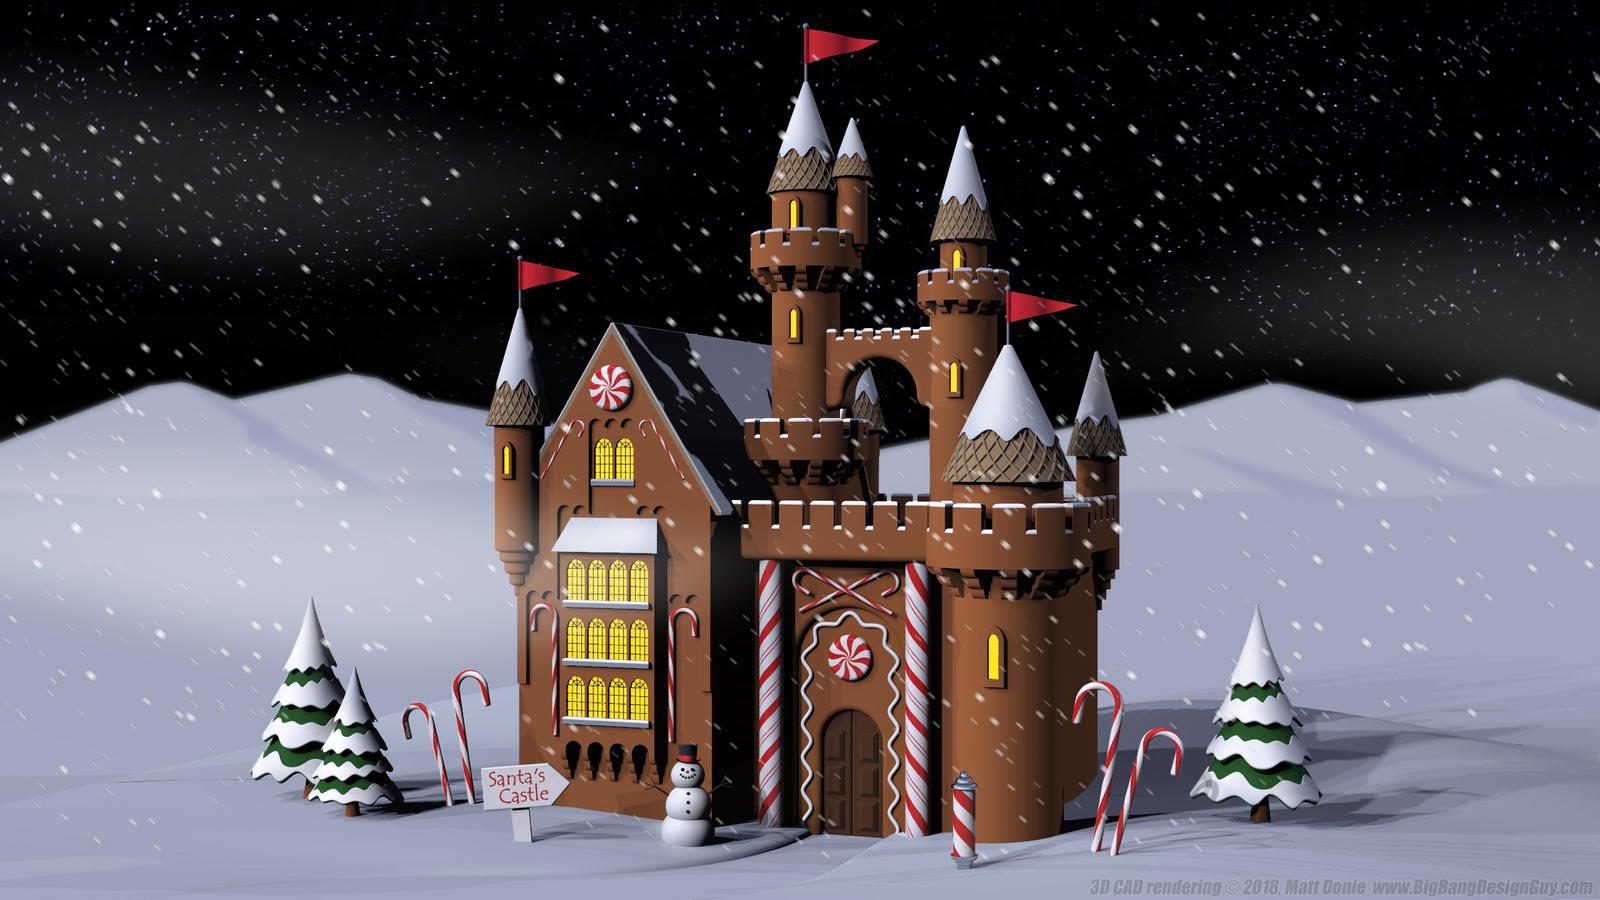 Santa S Gingerbread Castle By Ravendeviant On Deviantart,Ikea Raskog Rolling Cart